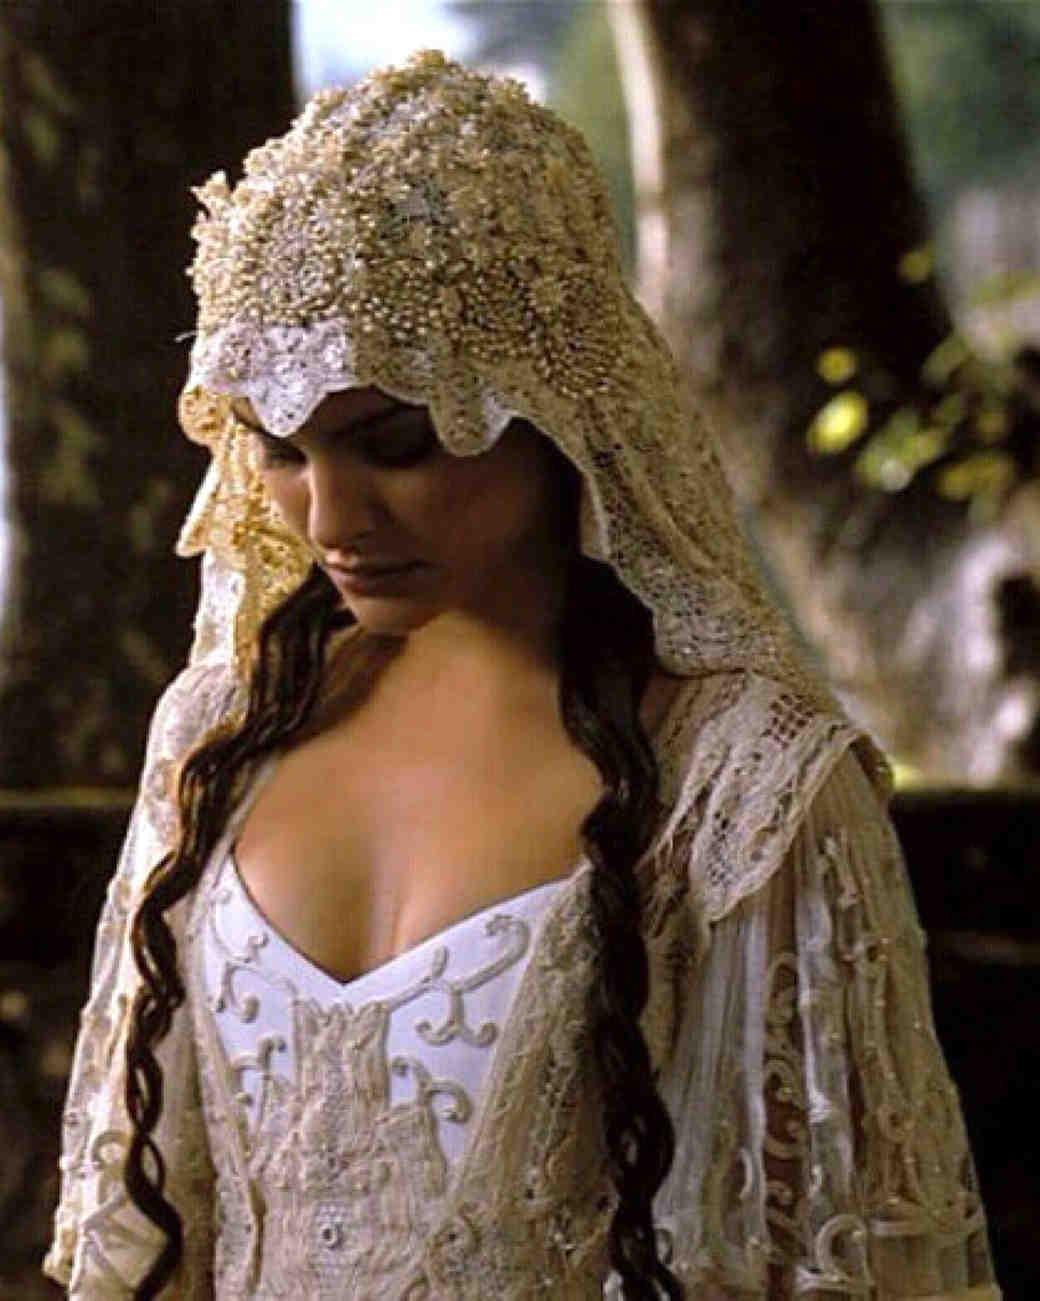 movie-wedding-dresses-star-wars-attack-of-the-clones-natalie-portman-0316.jpg